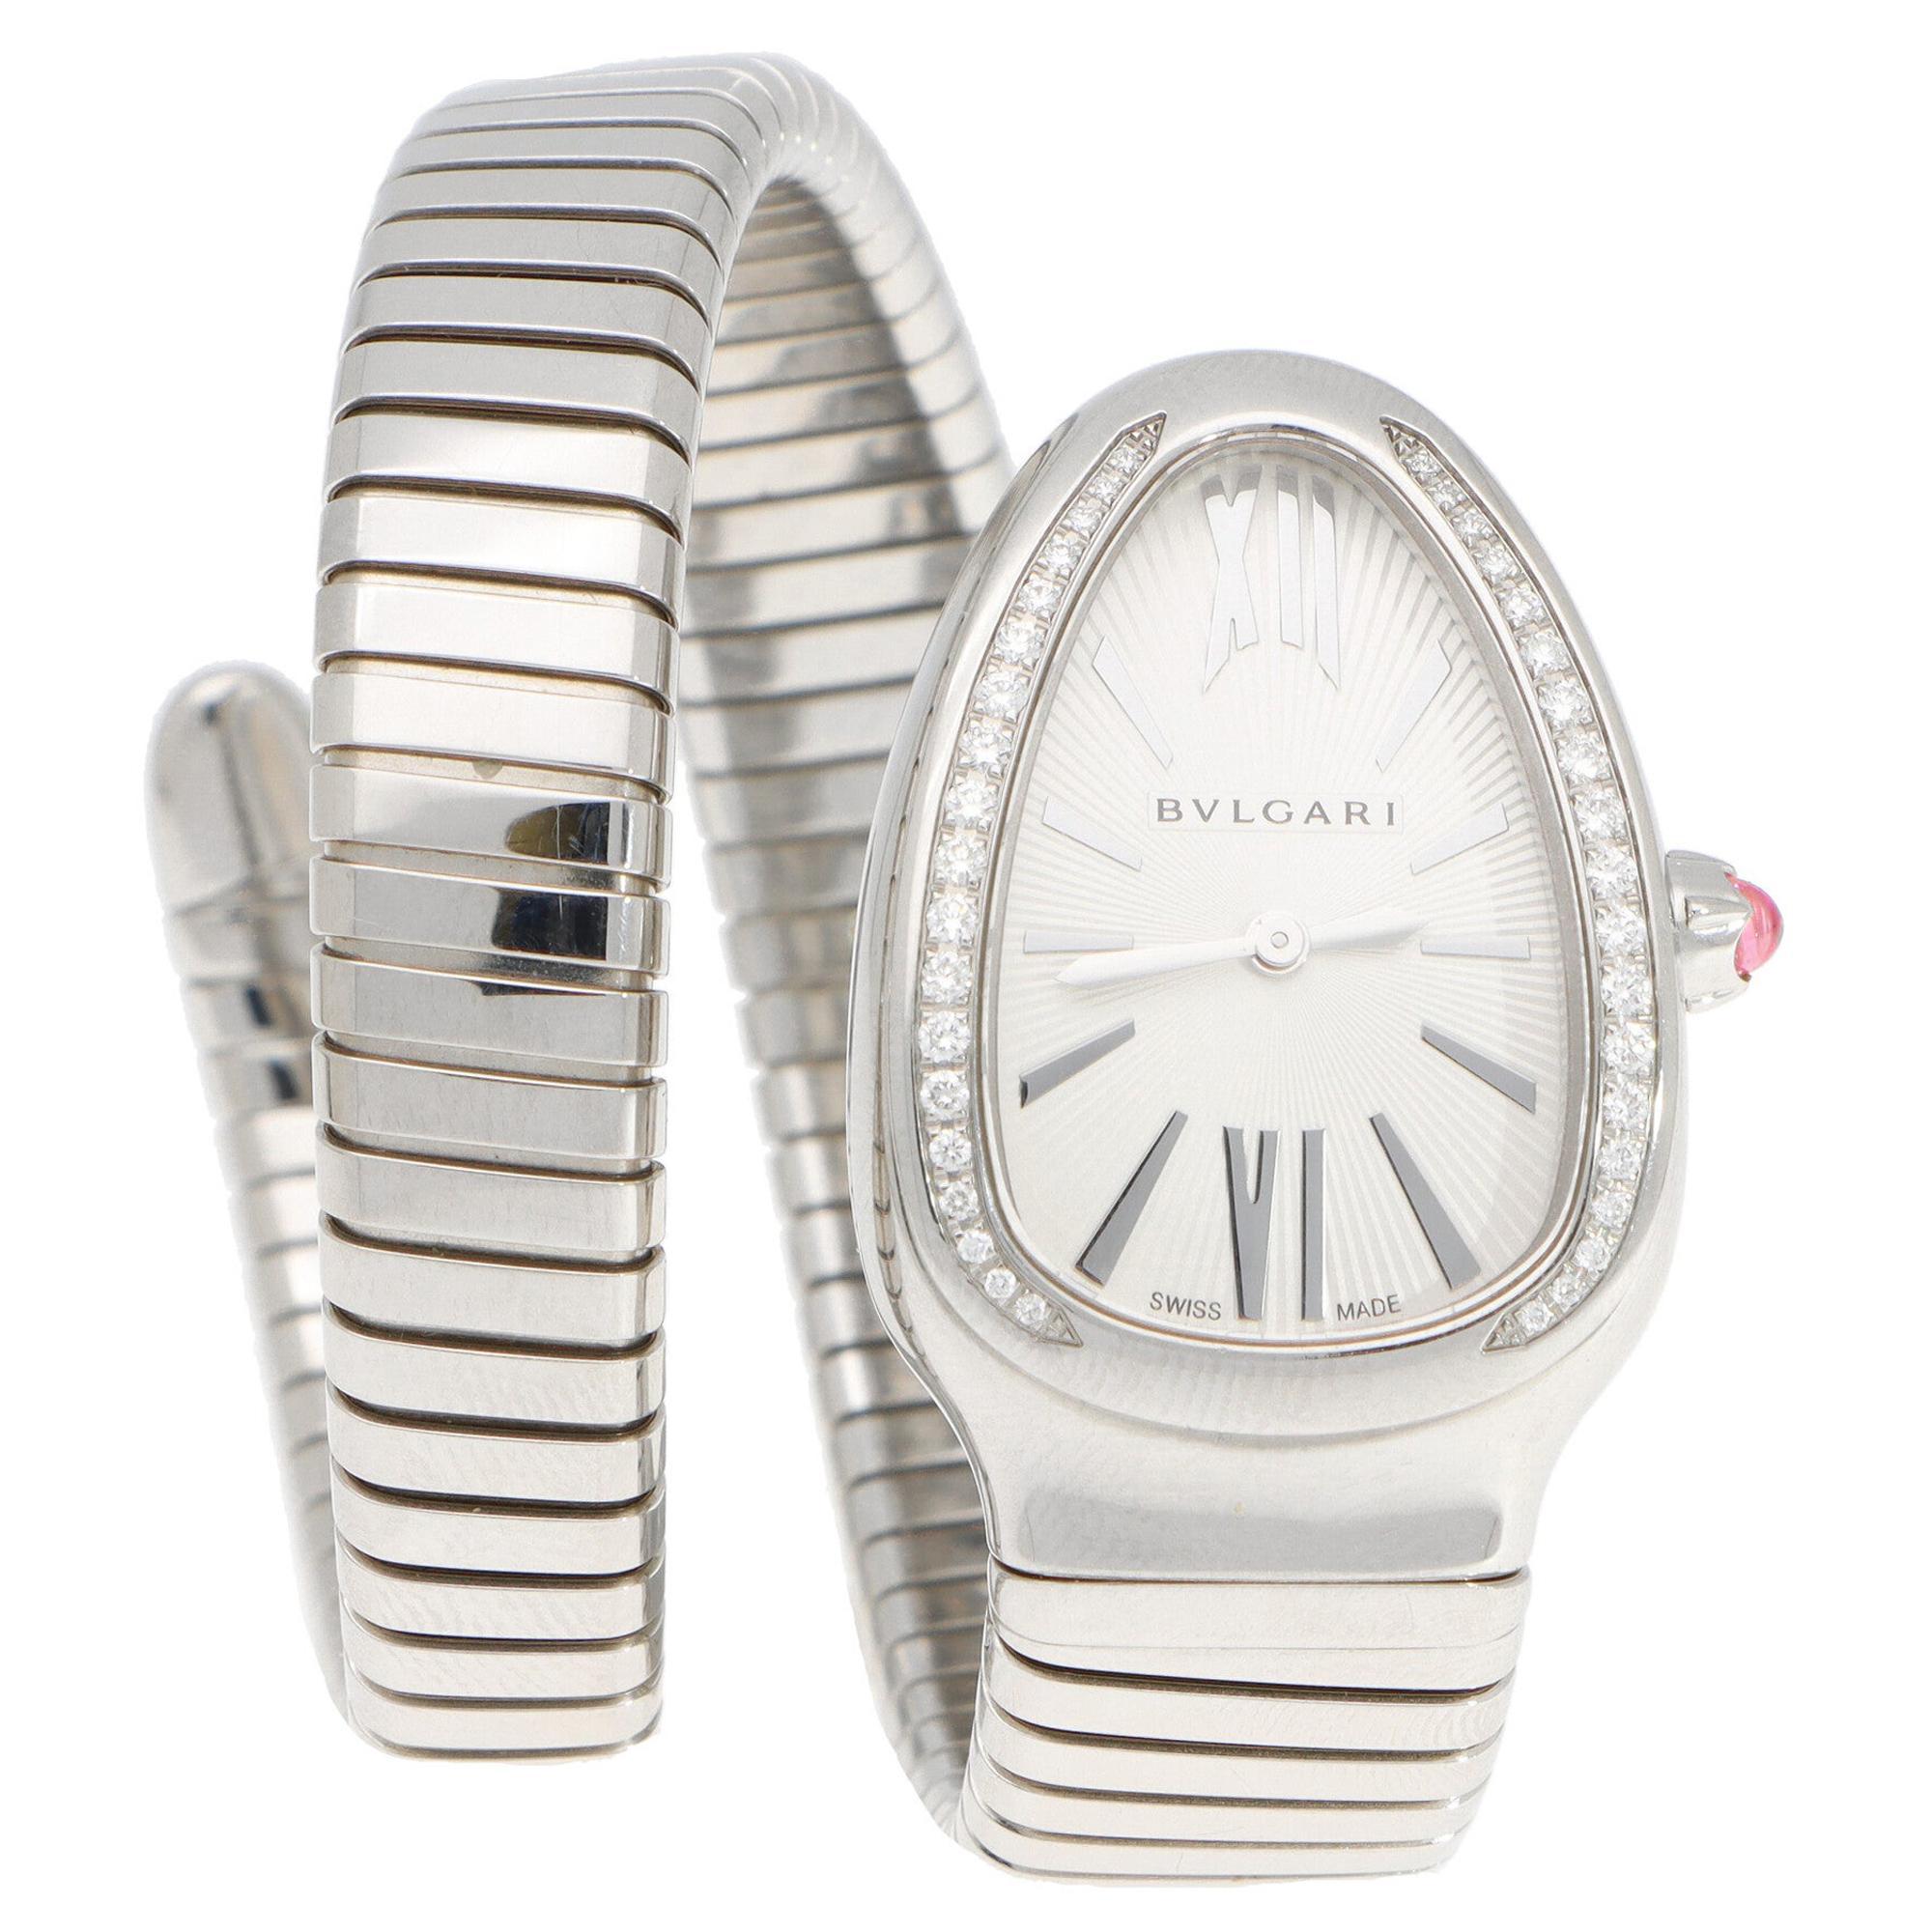 Bvlgari Diamond and Pink Rubellite Serpenti Tubogas Wrist Watch Stainless Steel